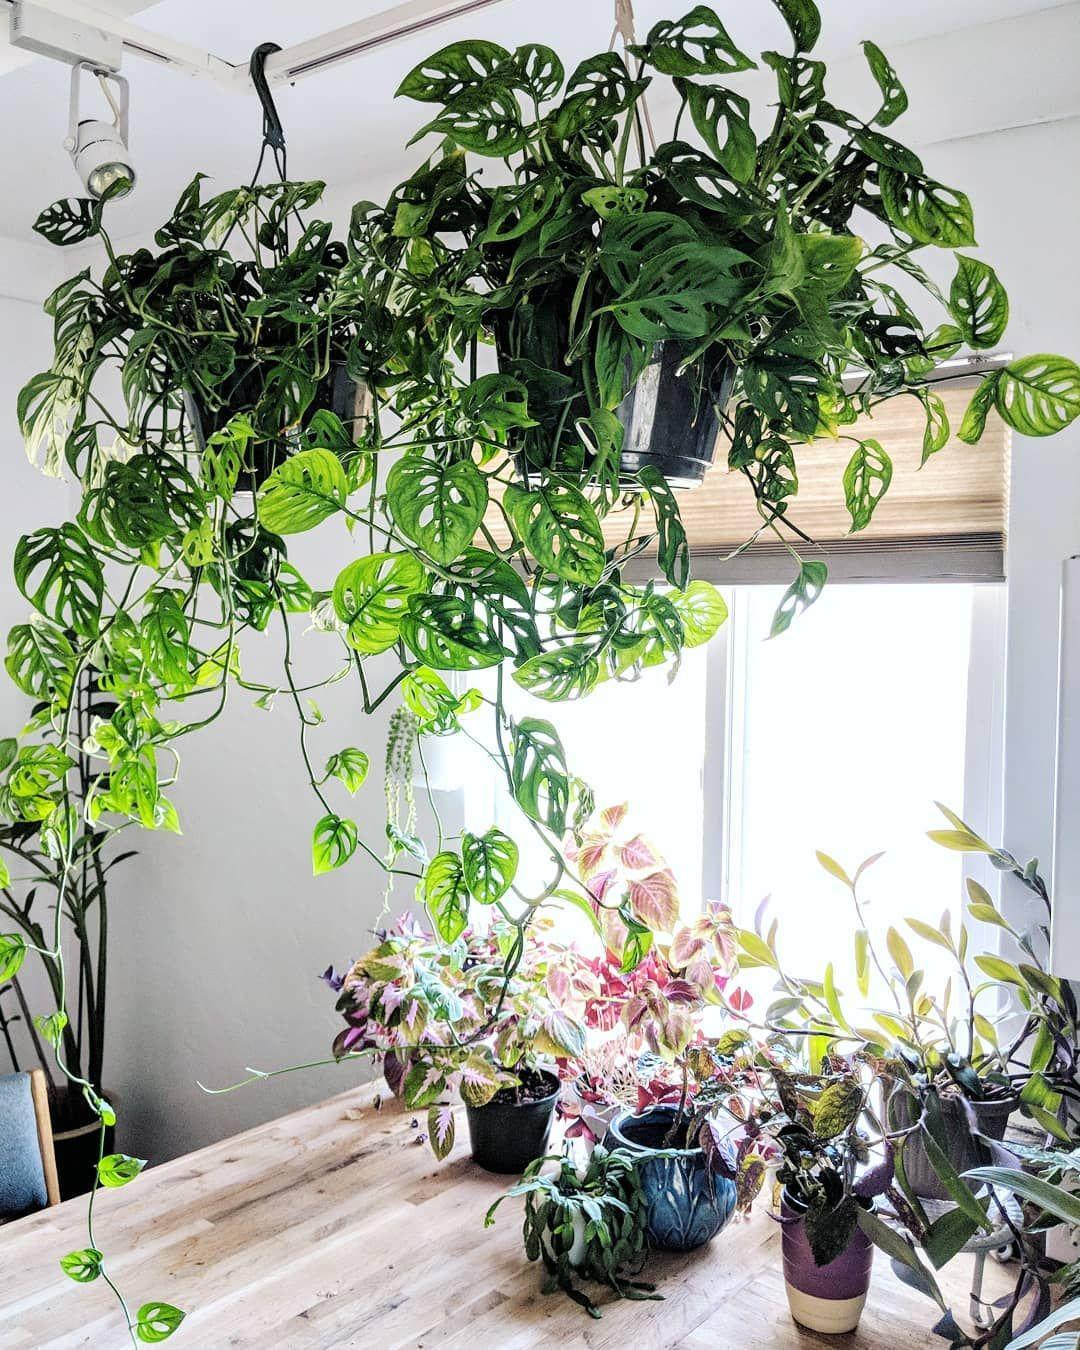 Hanging Plant to Grow Vigorously